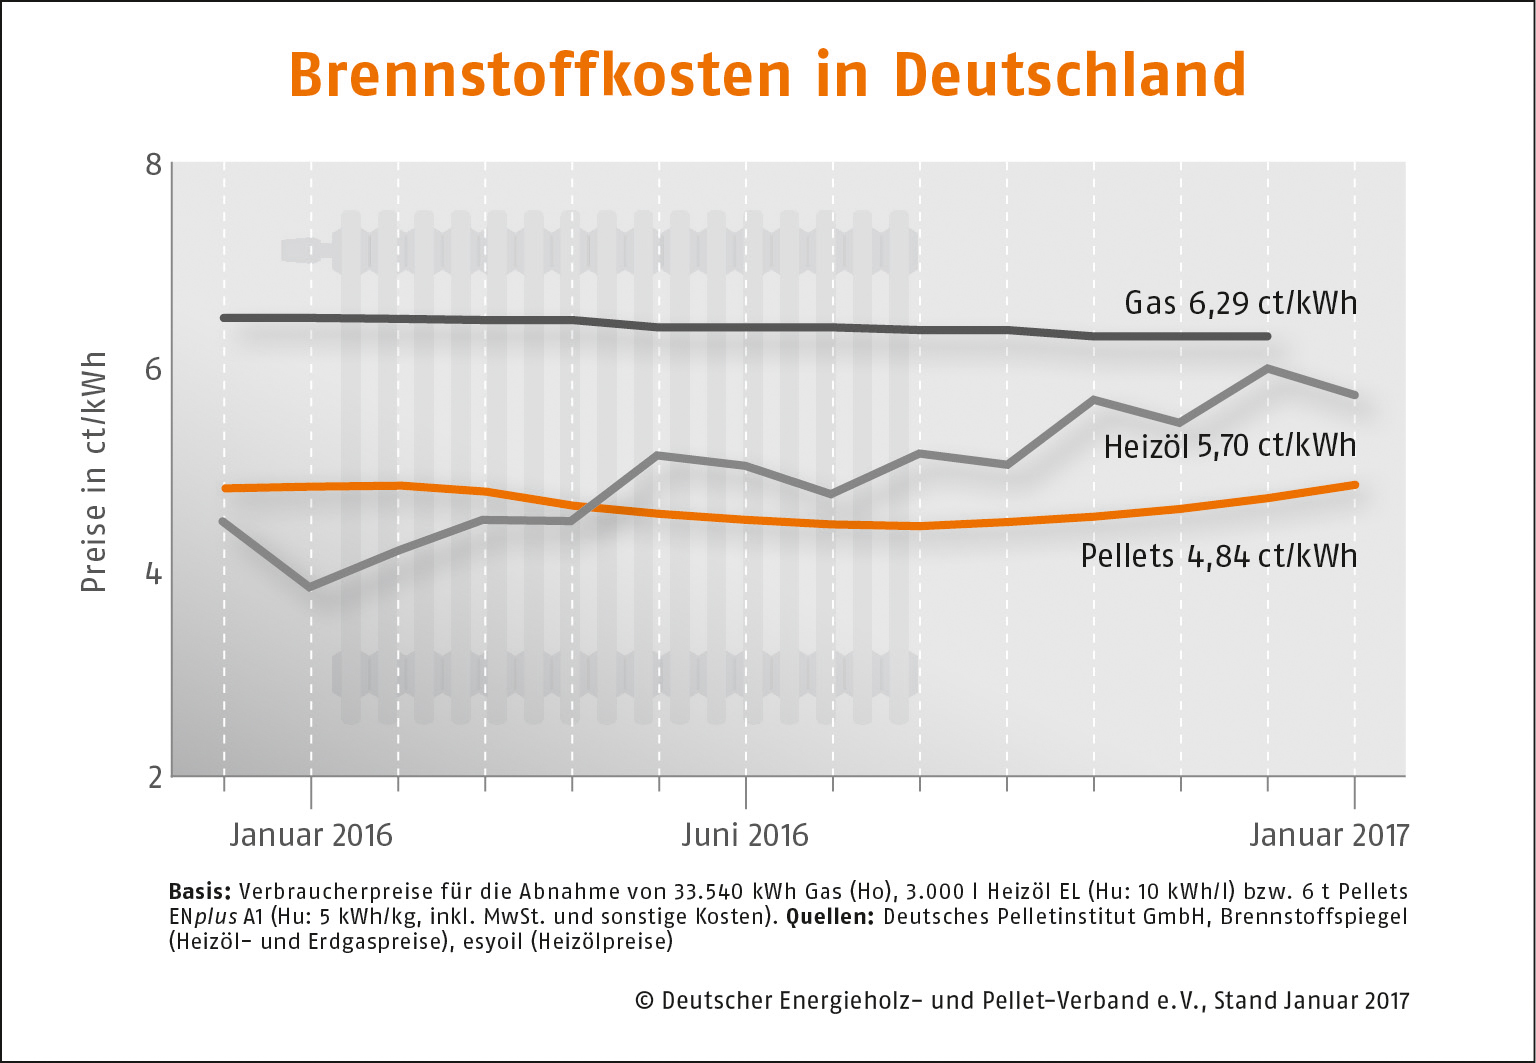 DEPI_Brennstoffkosten-Deutschland_Januar_2017 (2).jpg